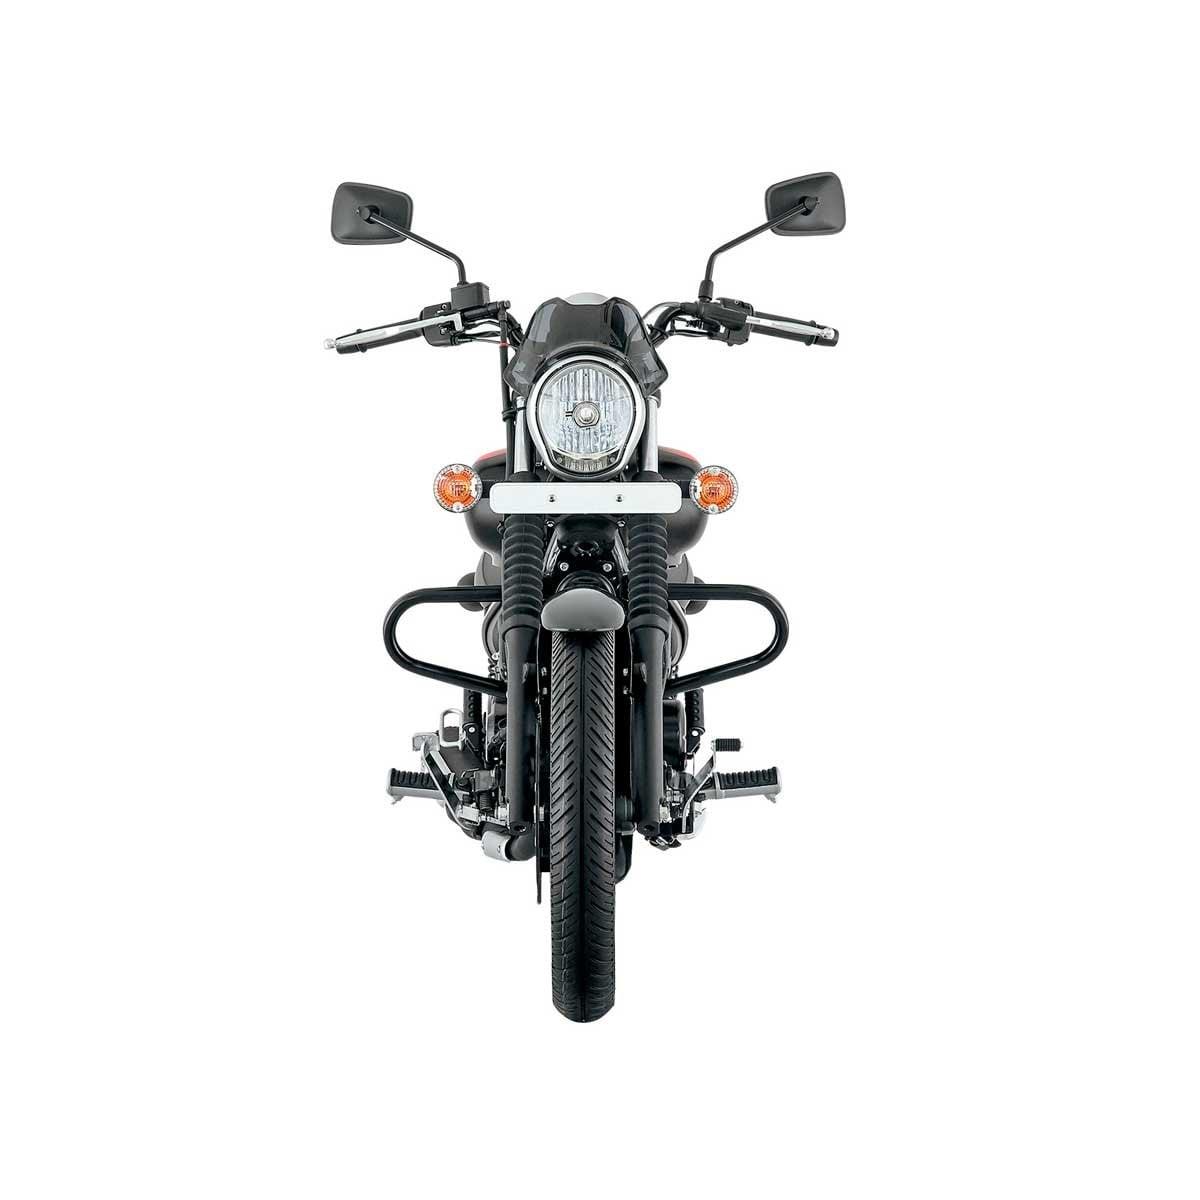 Motocicleta Avenger 220 Cc Street Blanca Bajaj